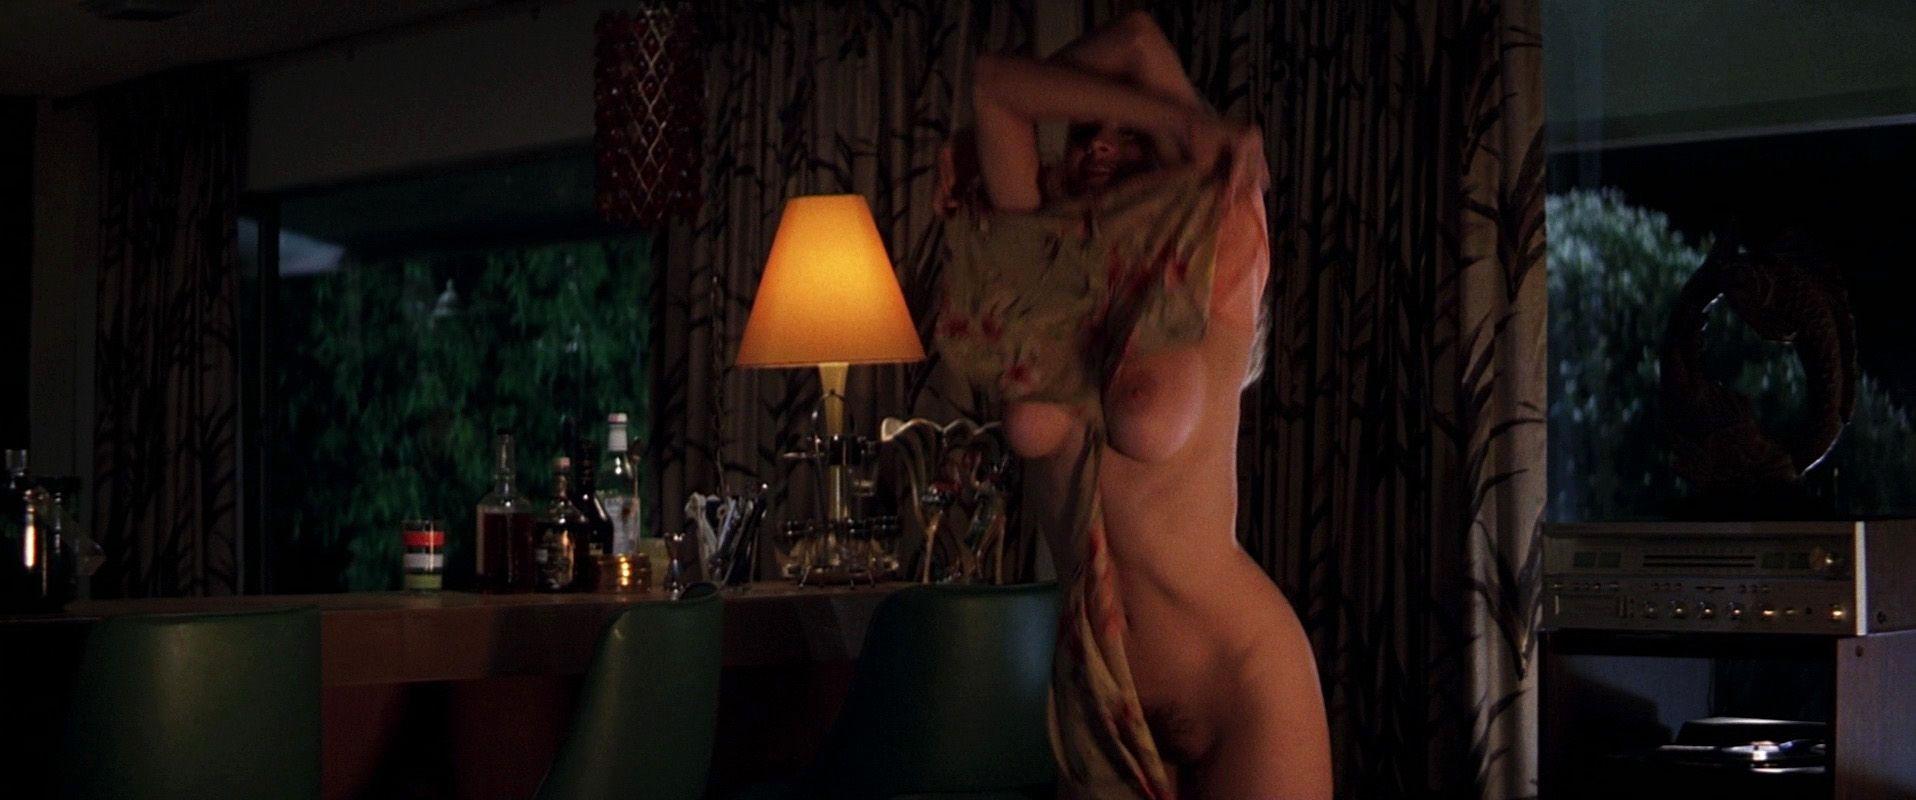 clip movie actress heather graham nude selfie